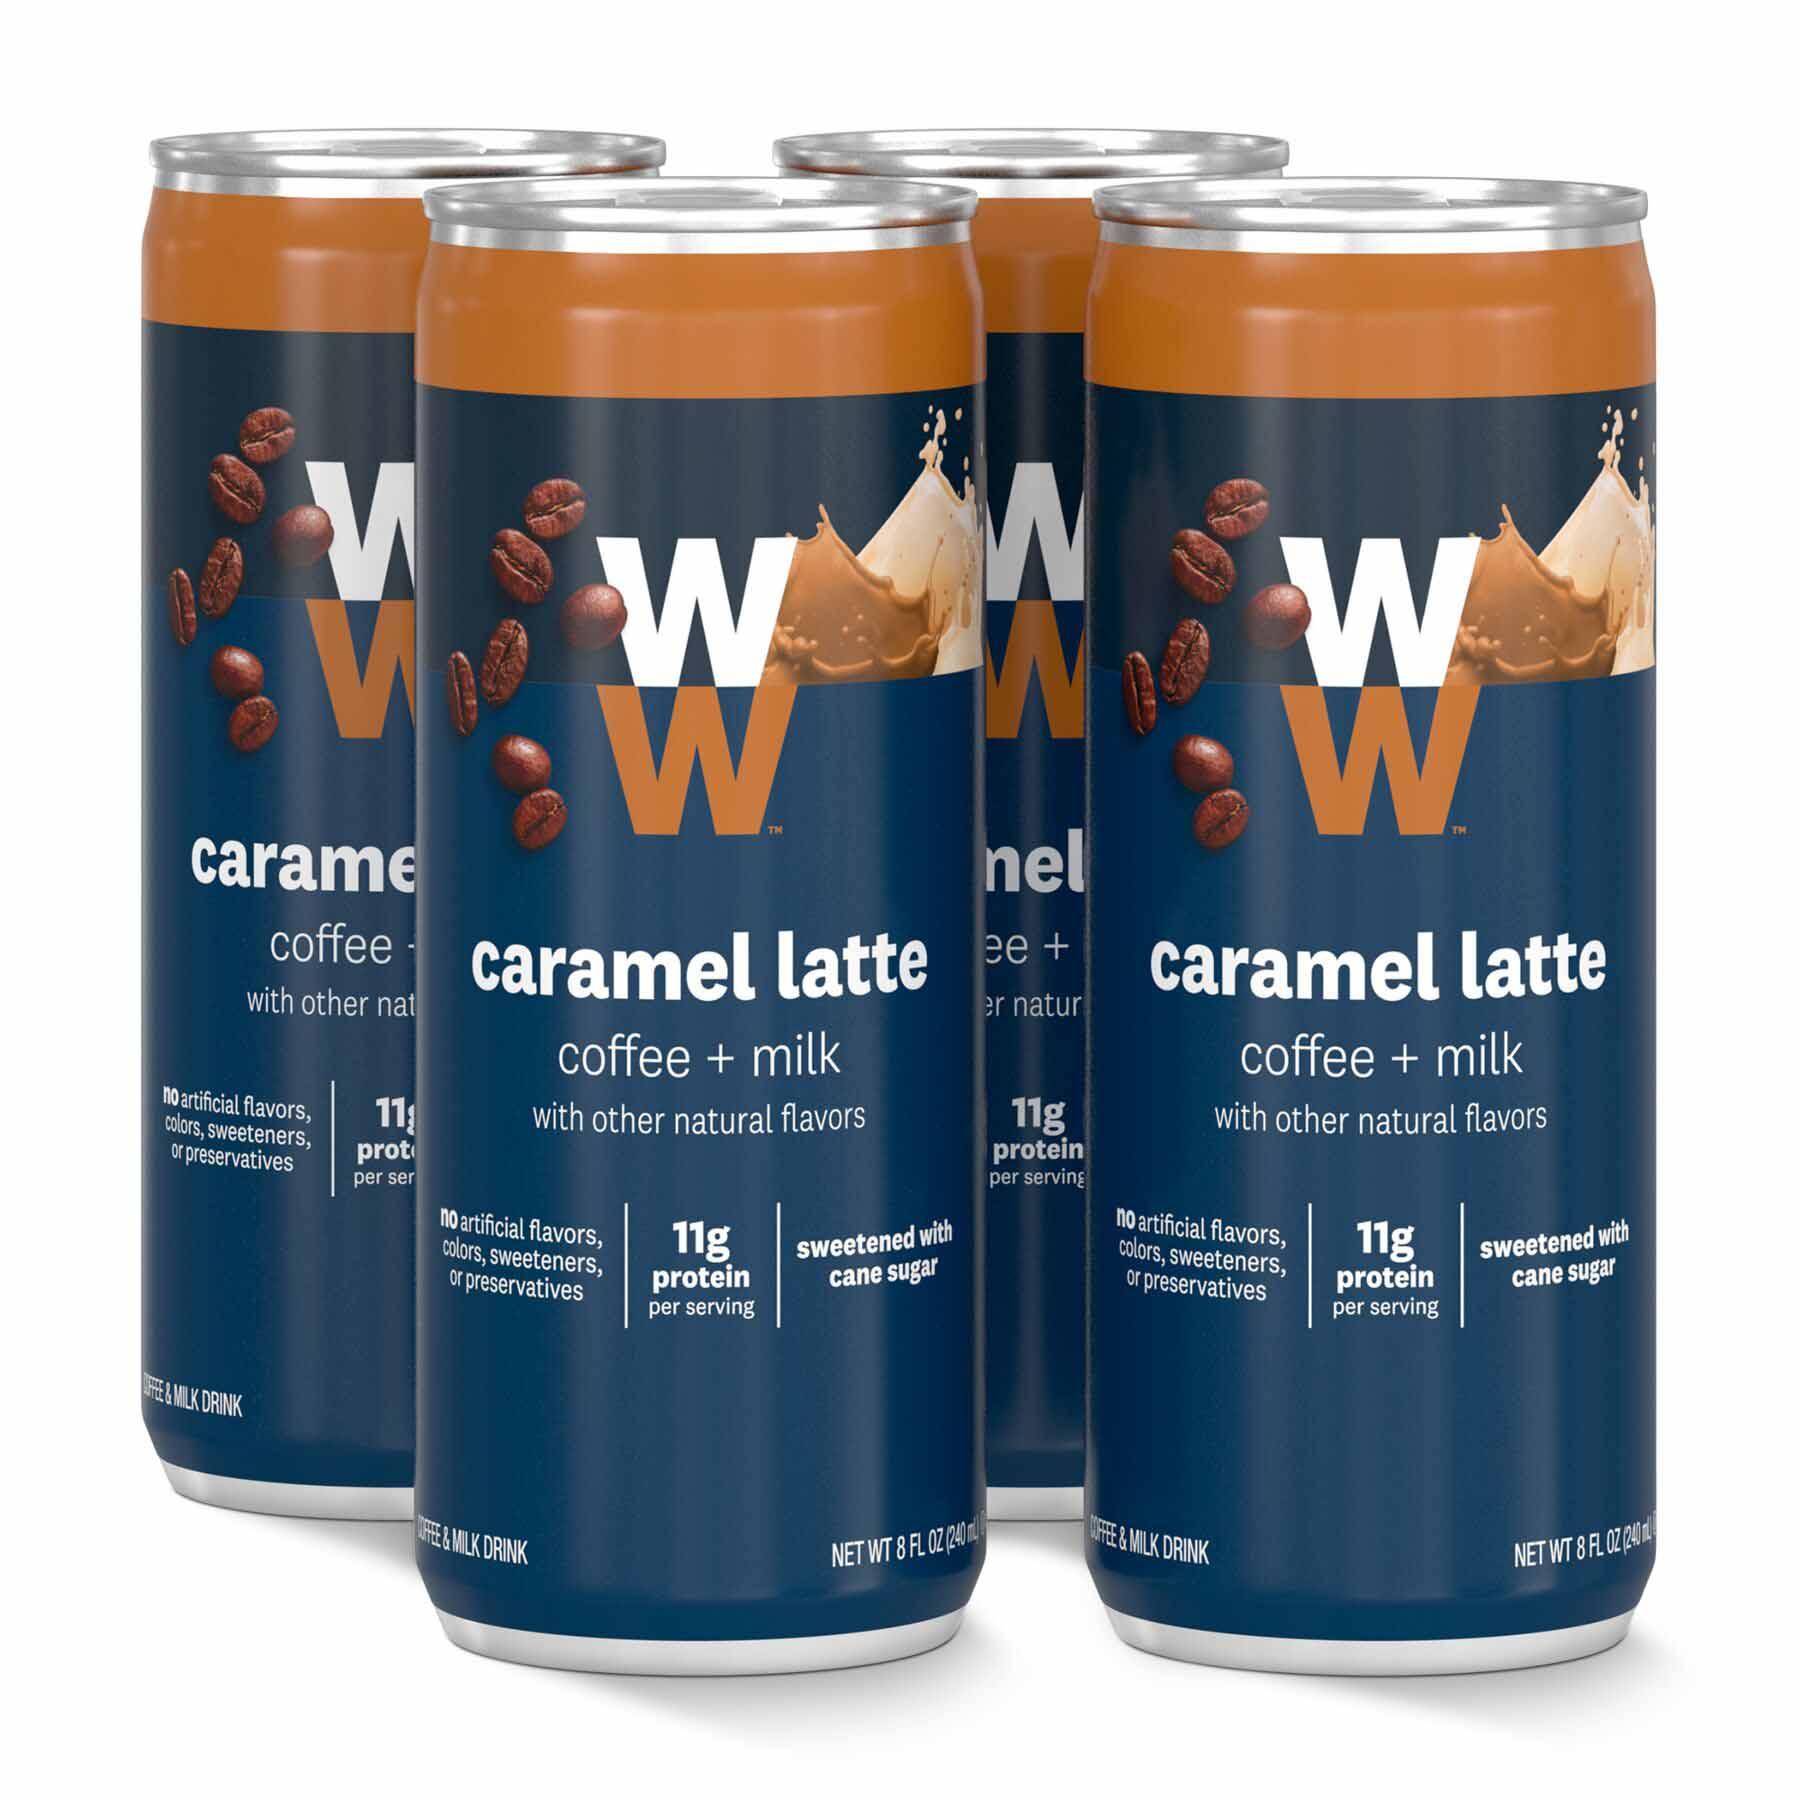 Caramel latte - 4 cans